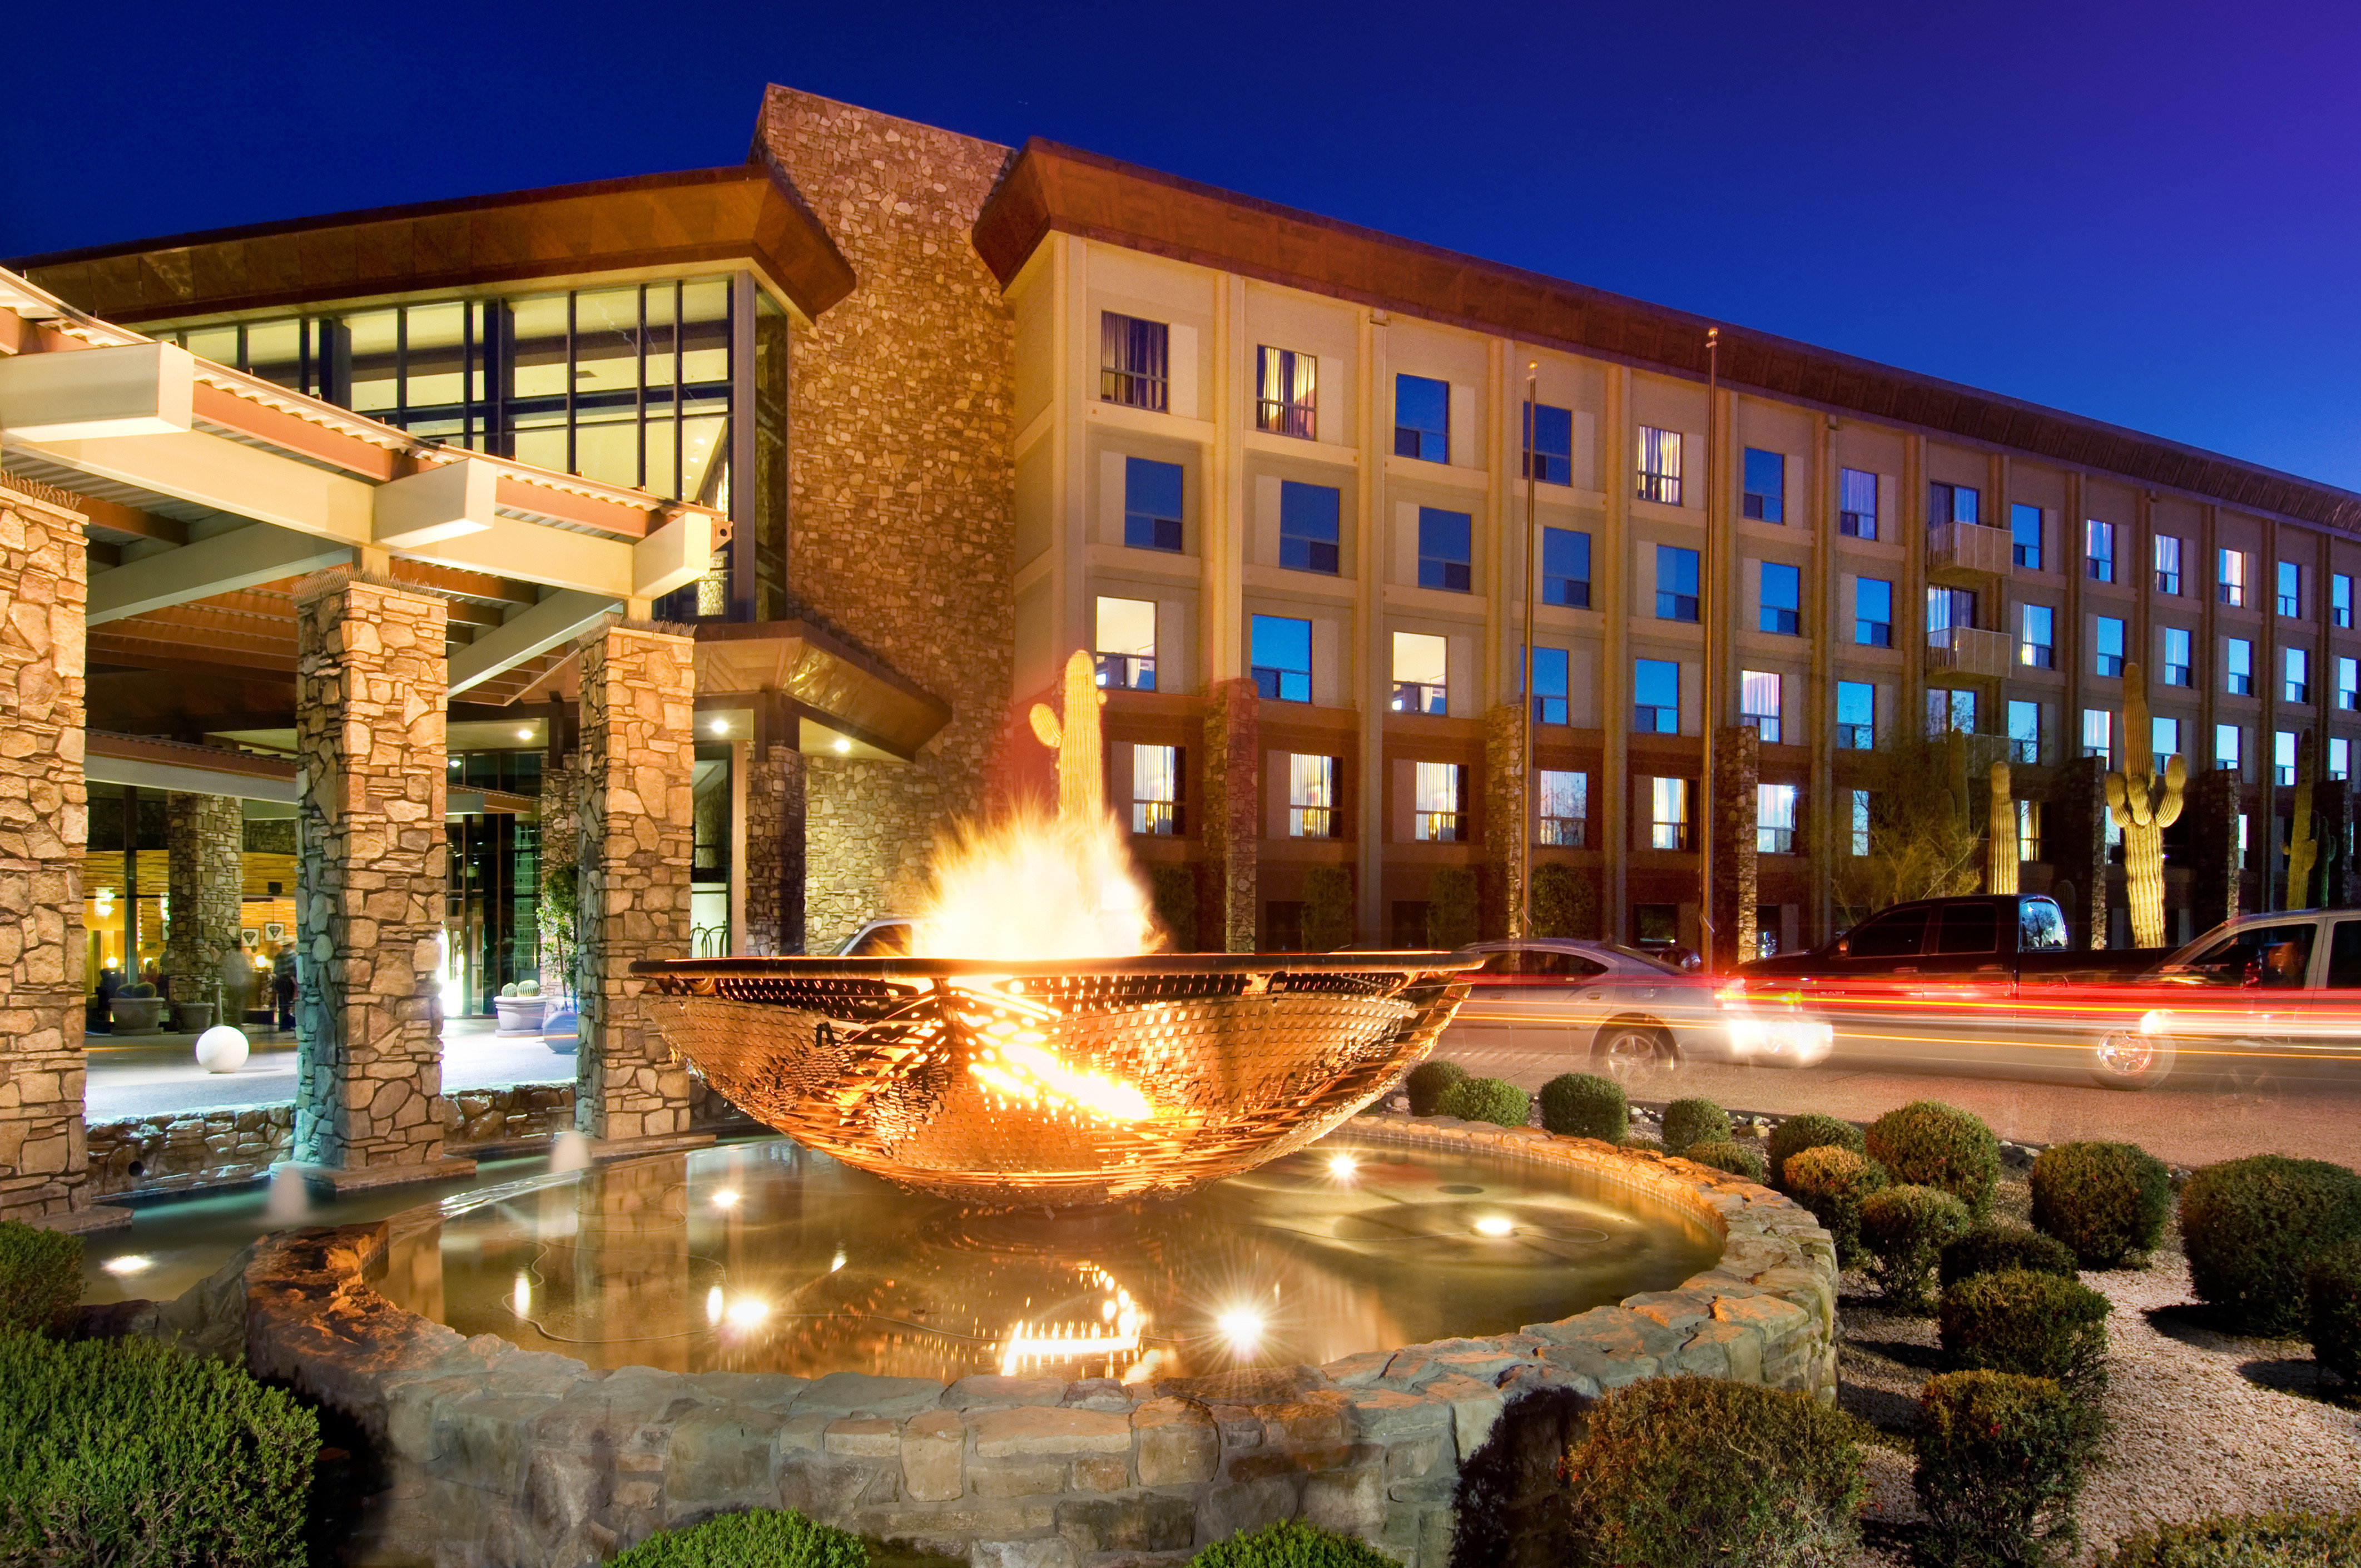 Exterior Firepit Resort sky plaza building landmark condominium water feature fountain palace Courtyard colonnade